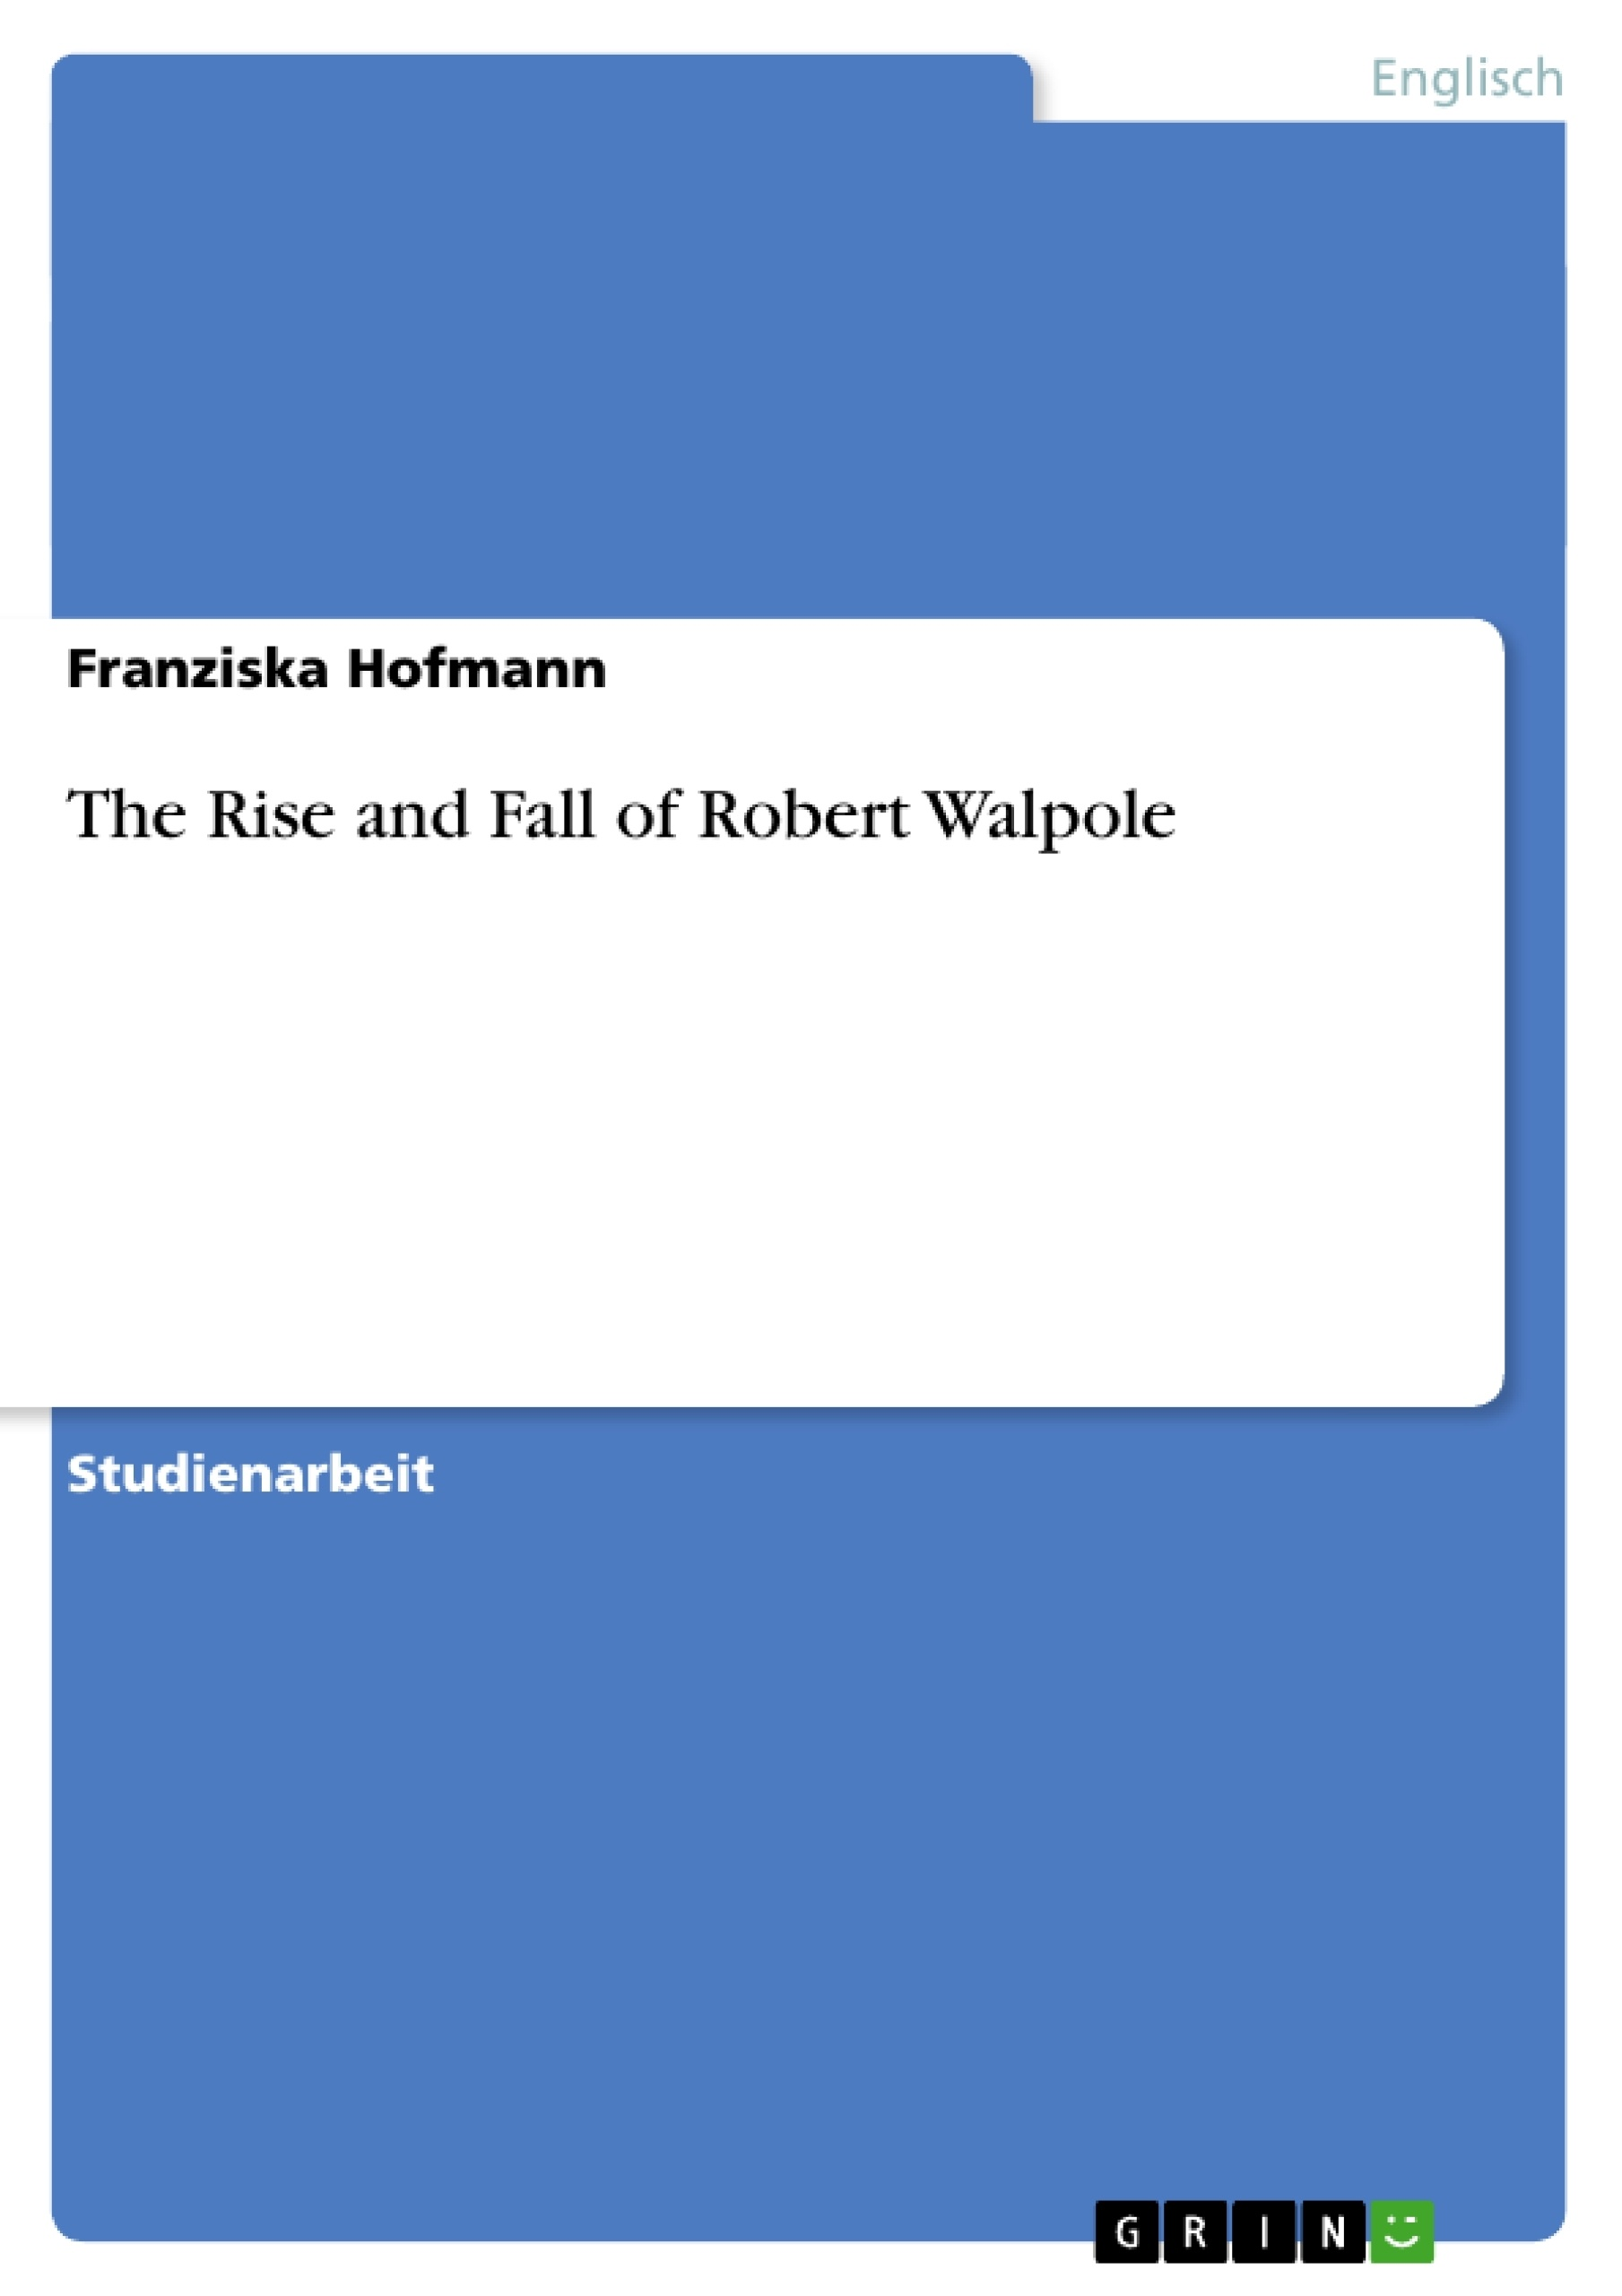 Titel: The Rise and Fall of Robert Walpole